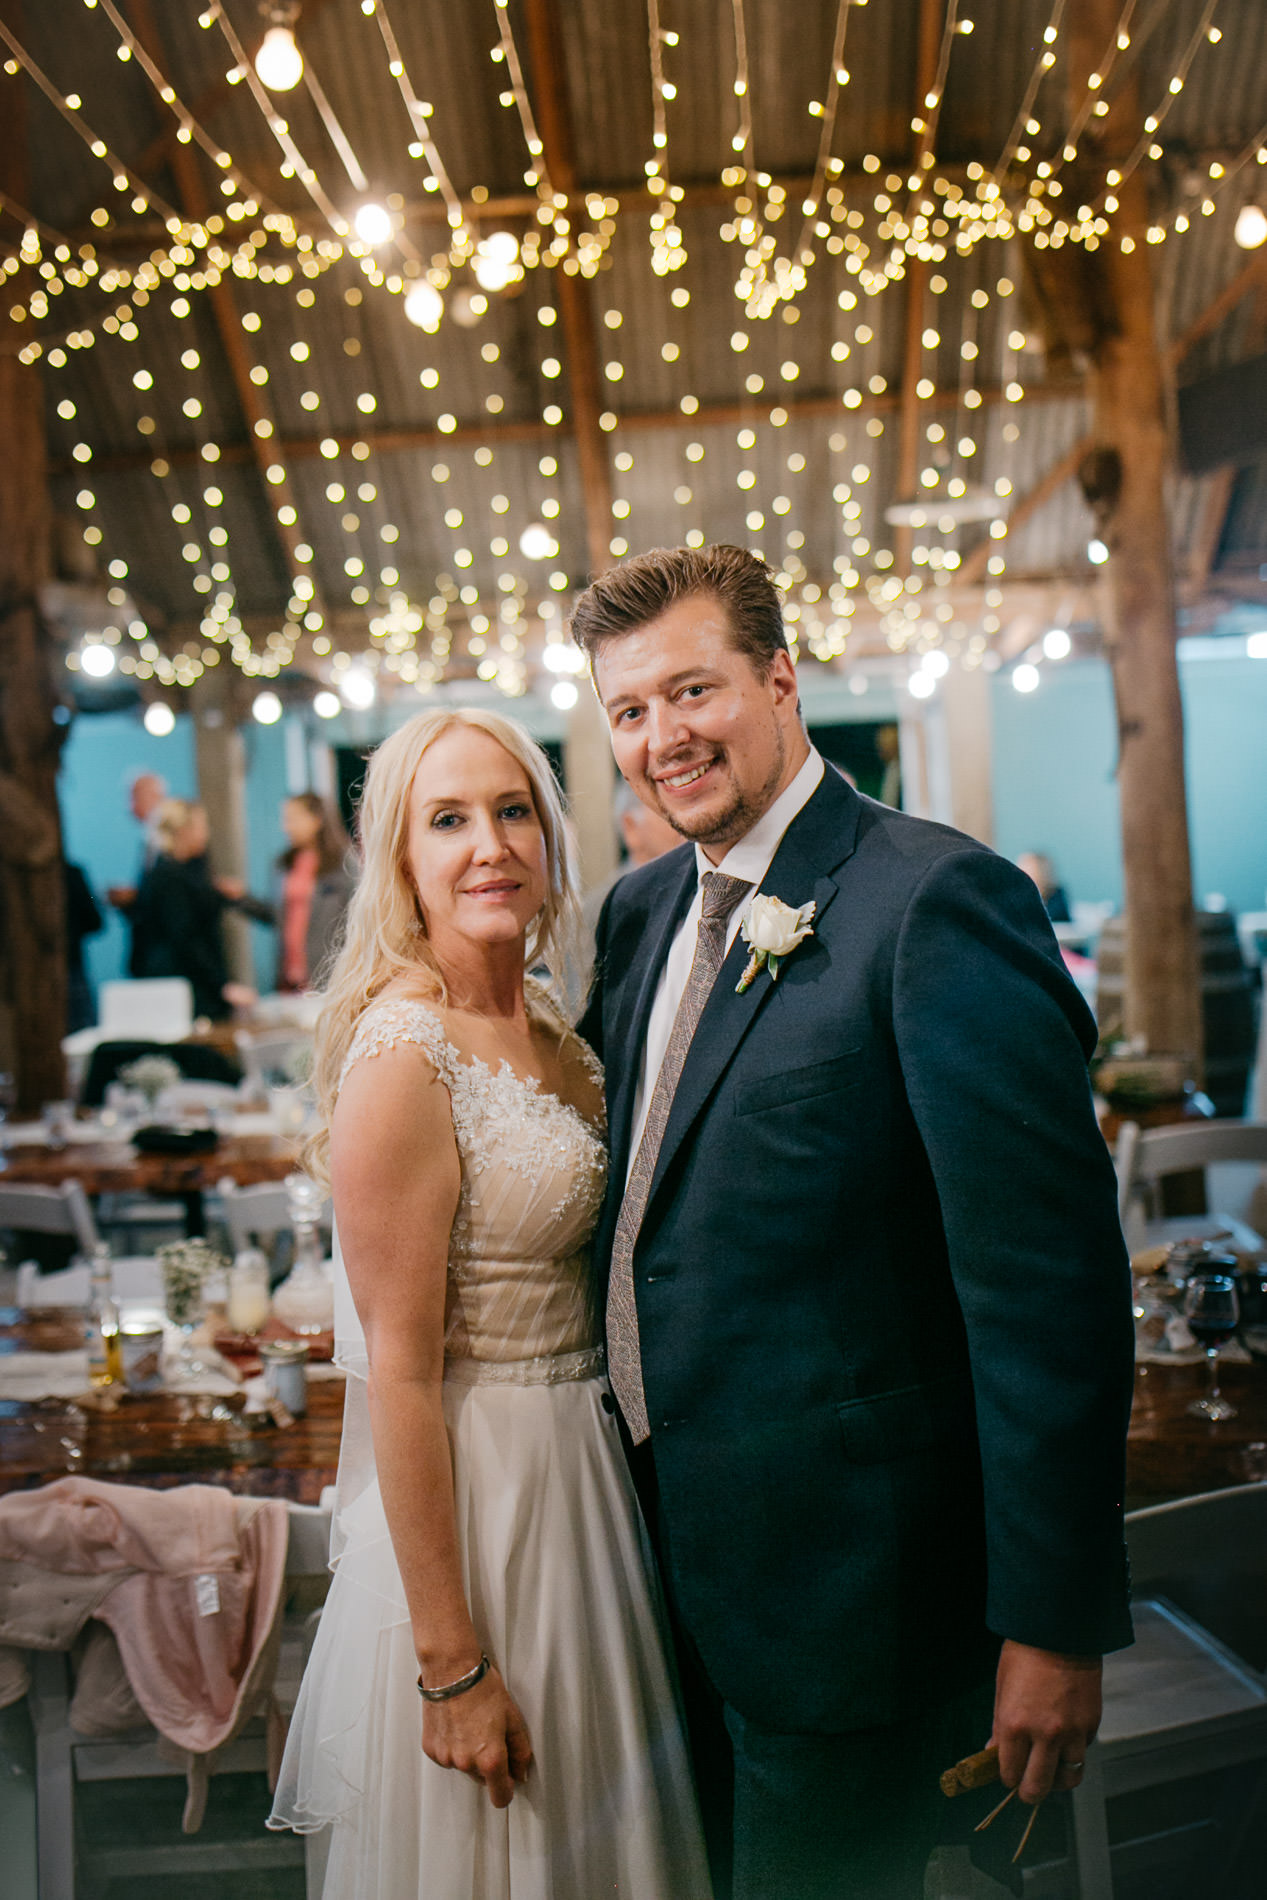 True North Photography_Boomerang Farm_Stacey and Isaac_Gold Coast Wedding_Barm Wedding_Hinterland Wedding-223.jpg